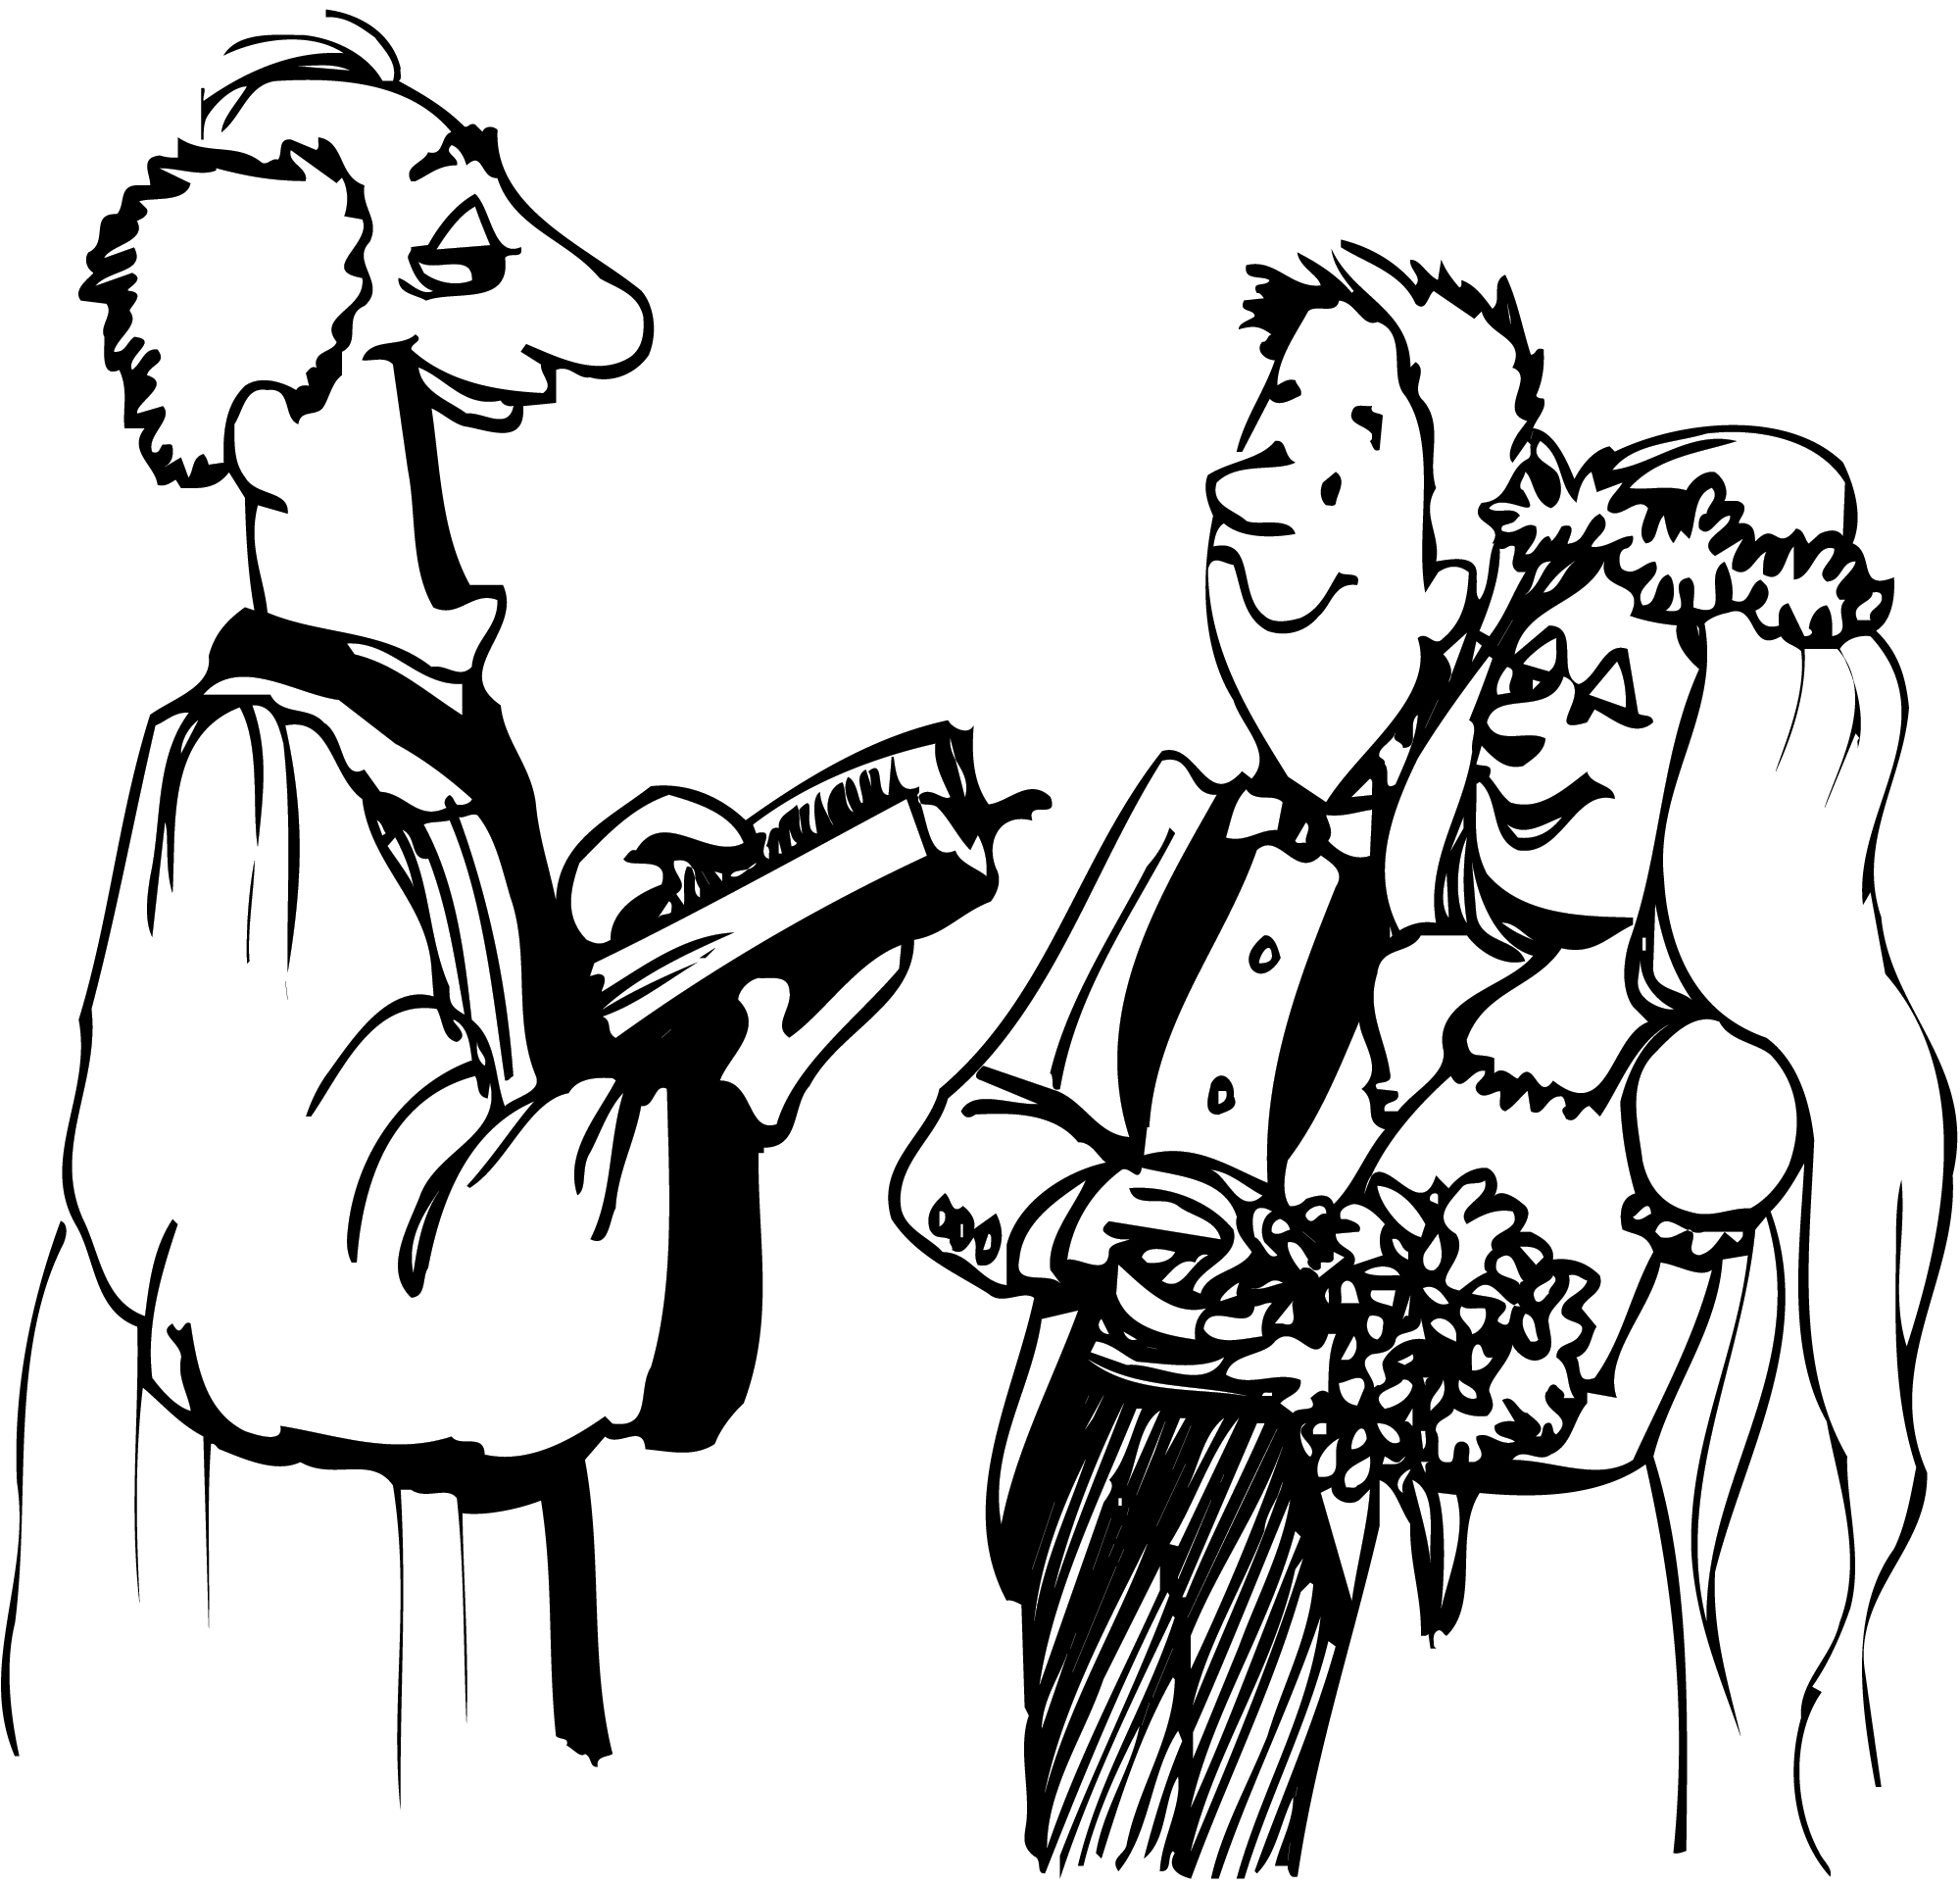 Weddingclipart-Weddingclipart-14